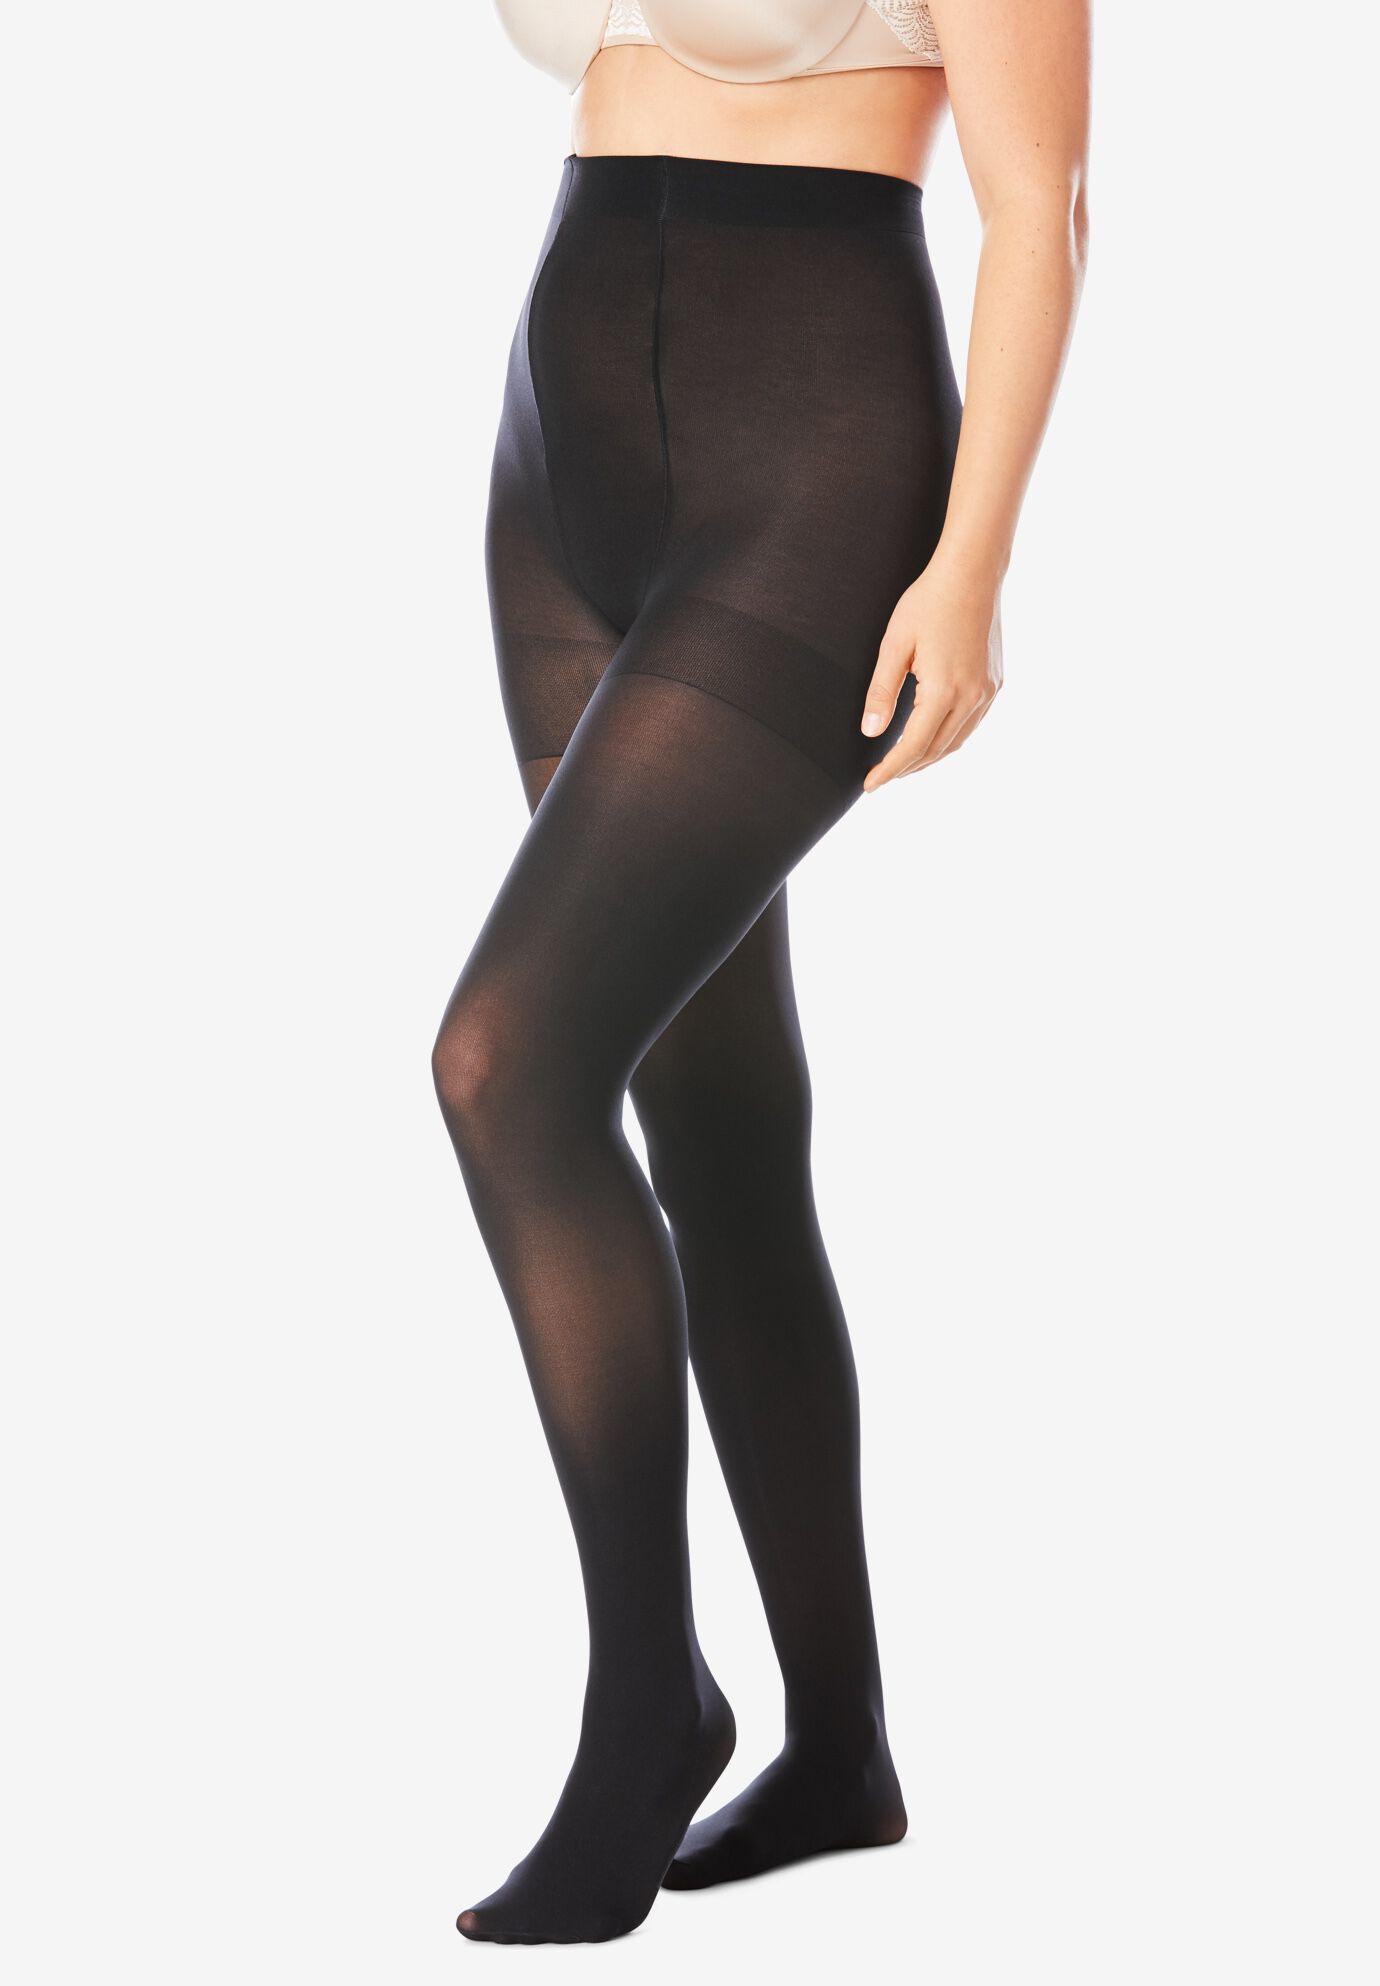 Women Lady Sheer Tights Stocking Panties Pantyhose Long Stockings Hosiery Pack